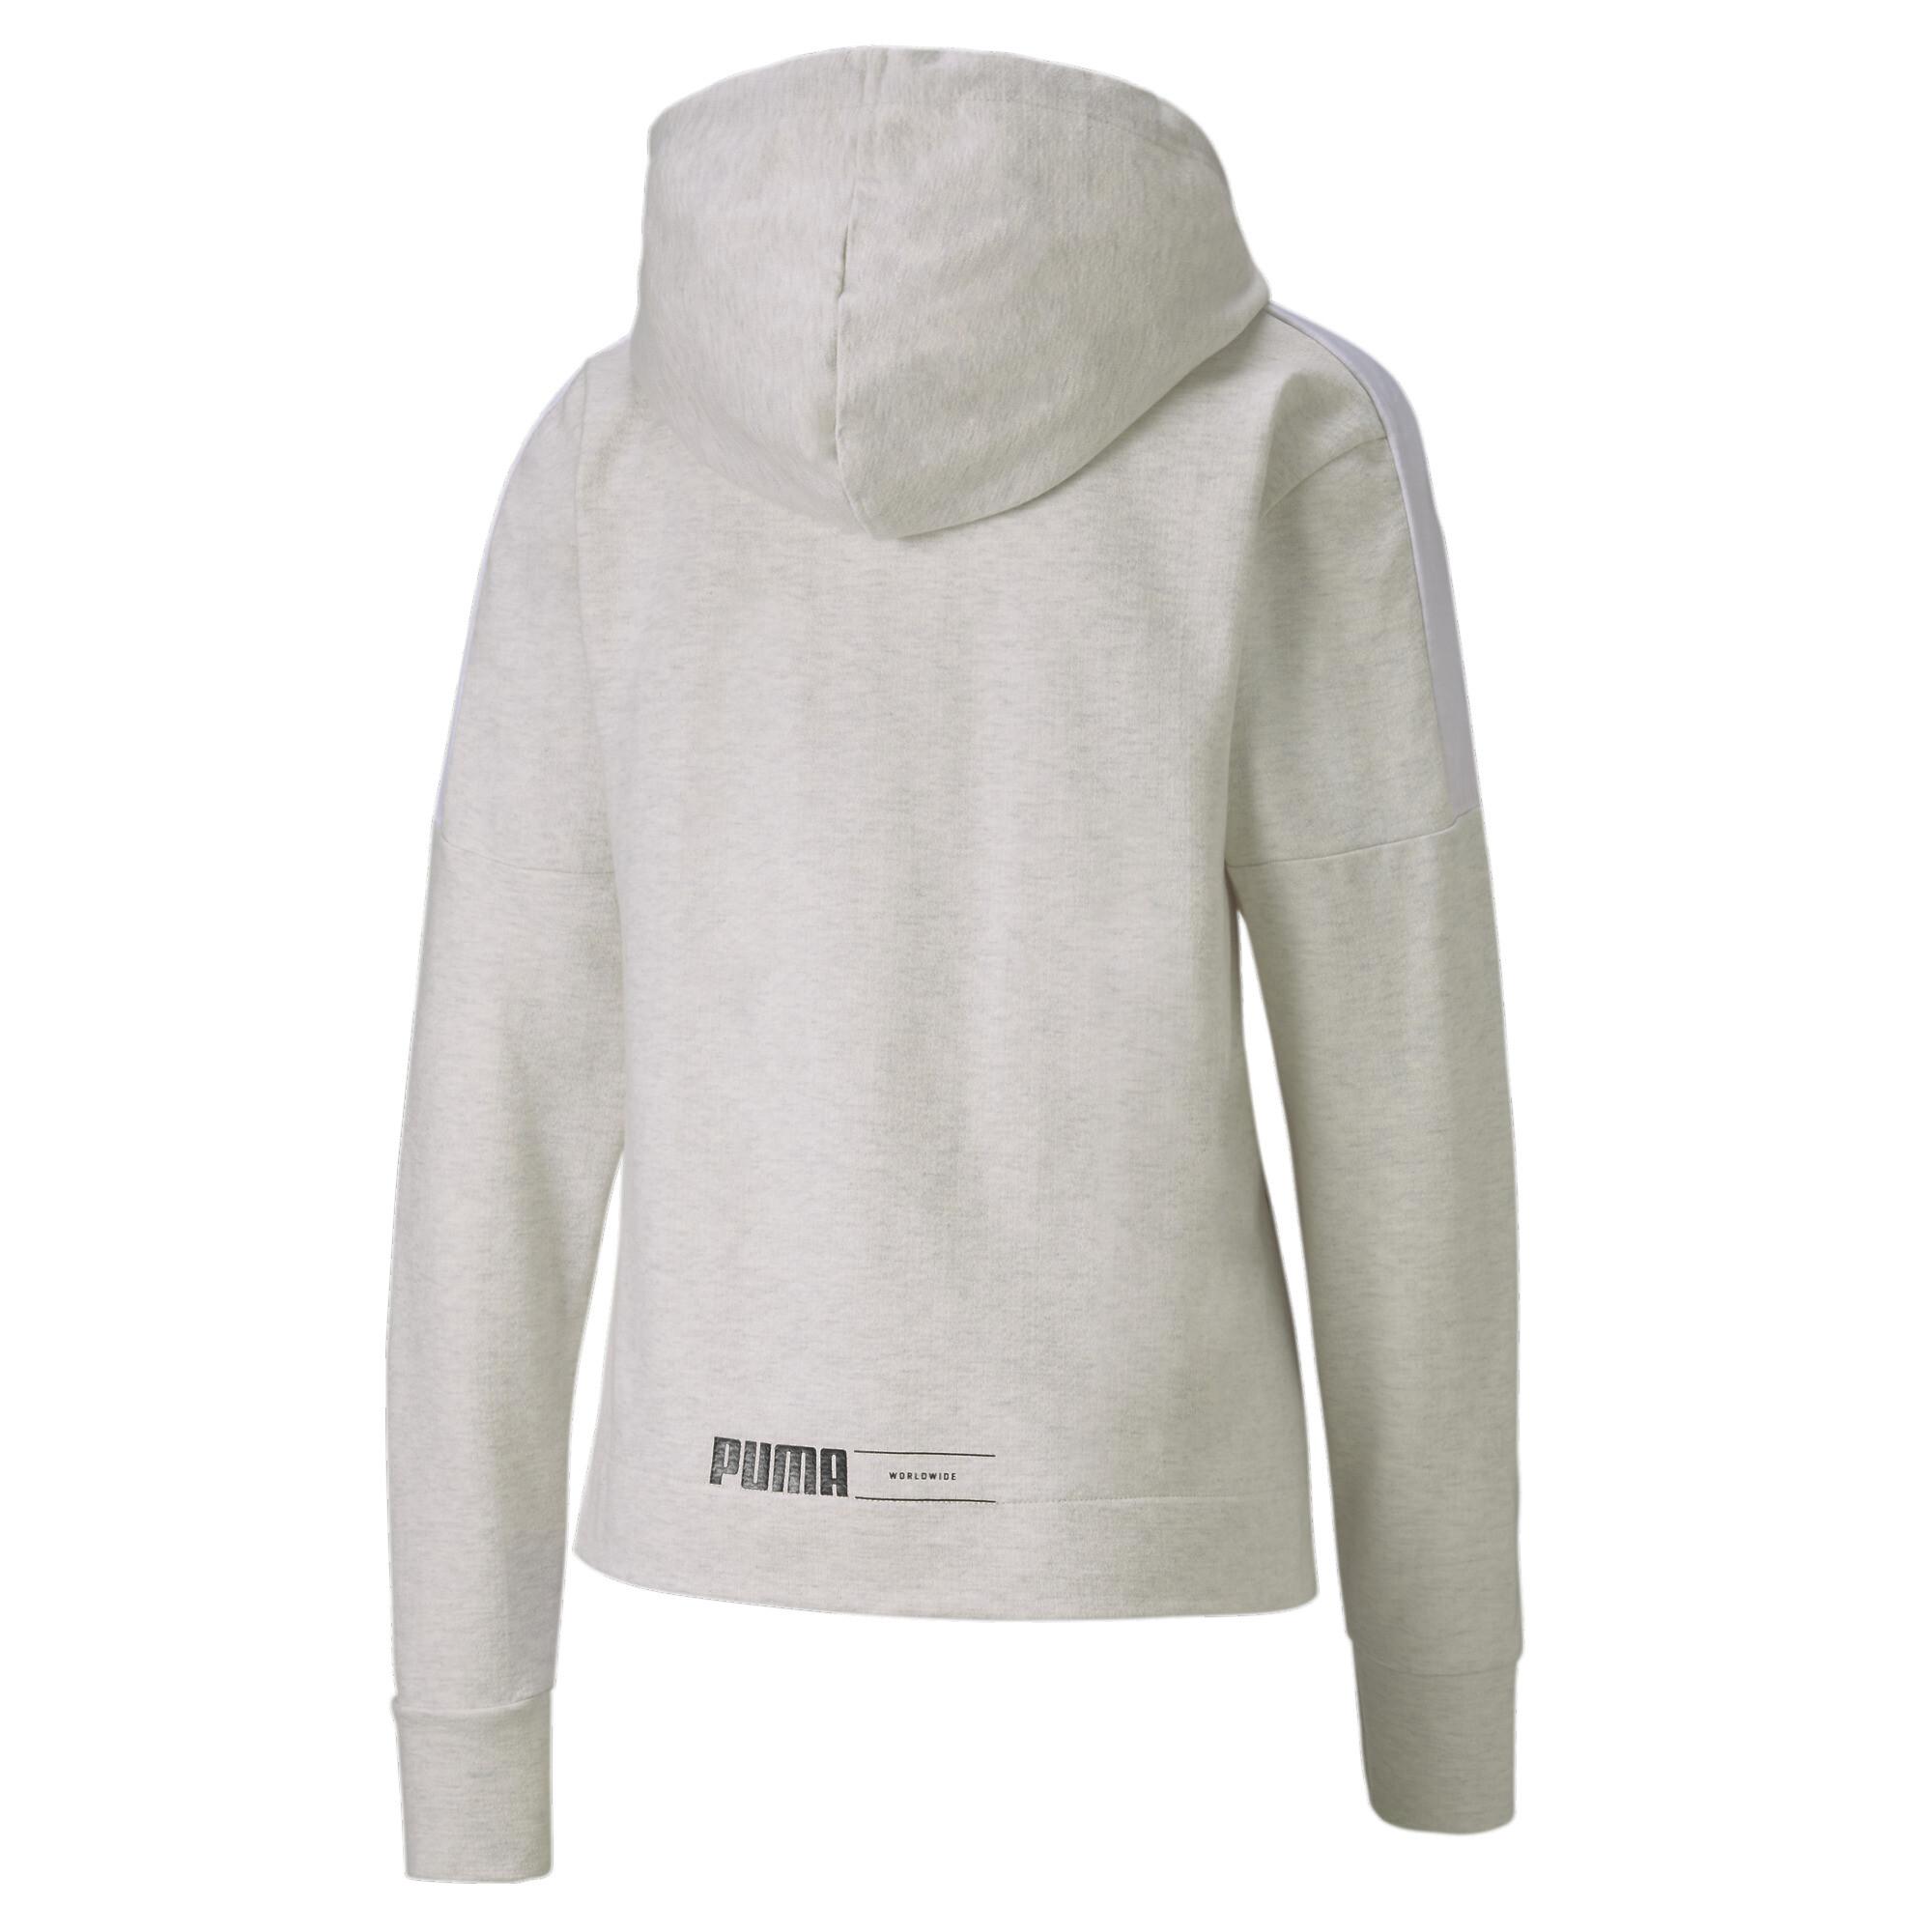 PUMA-NU-TILITY-Women-039-s-Full-Zip-Hoodie-Women-Sweat-Basics miniatuur 14